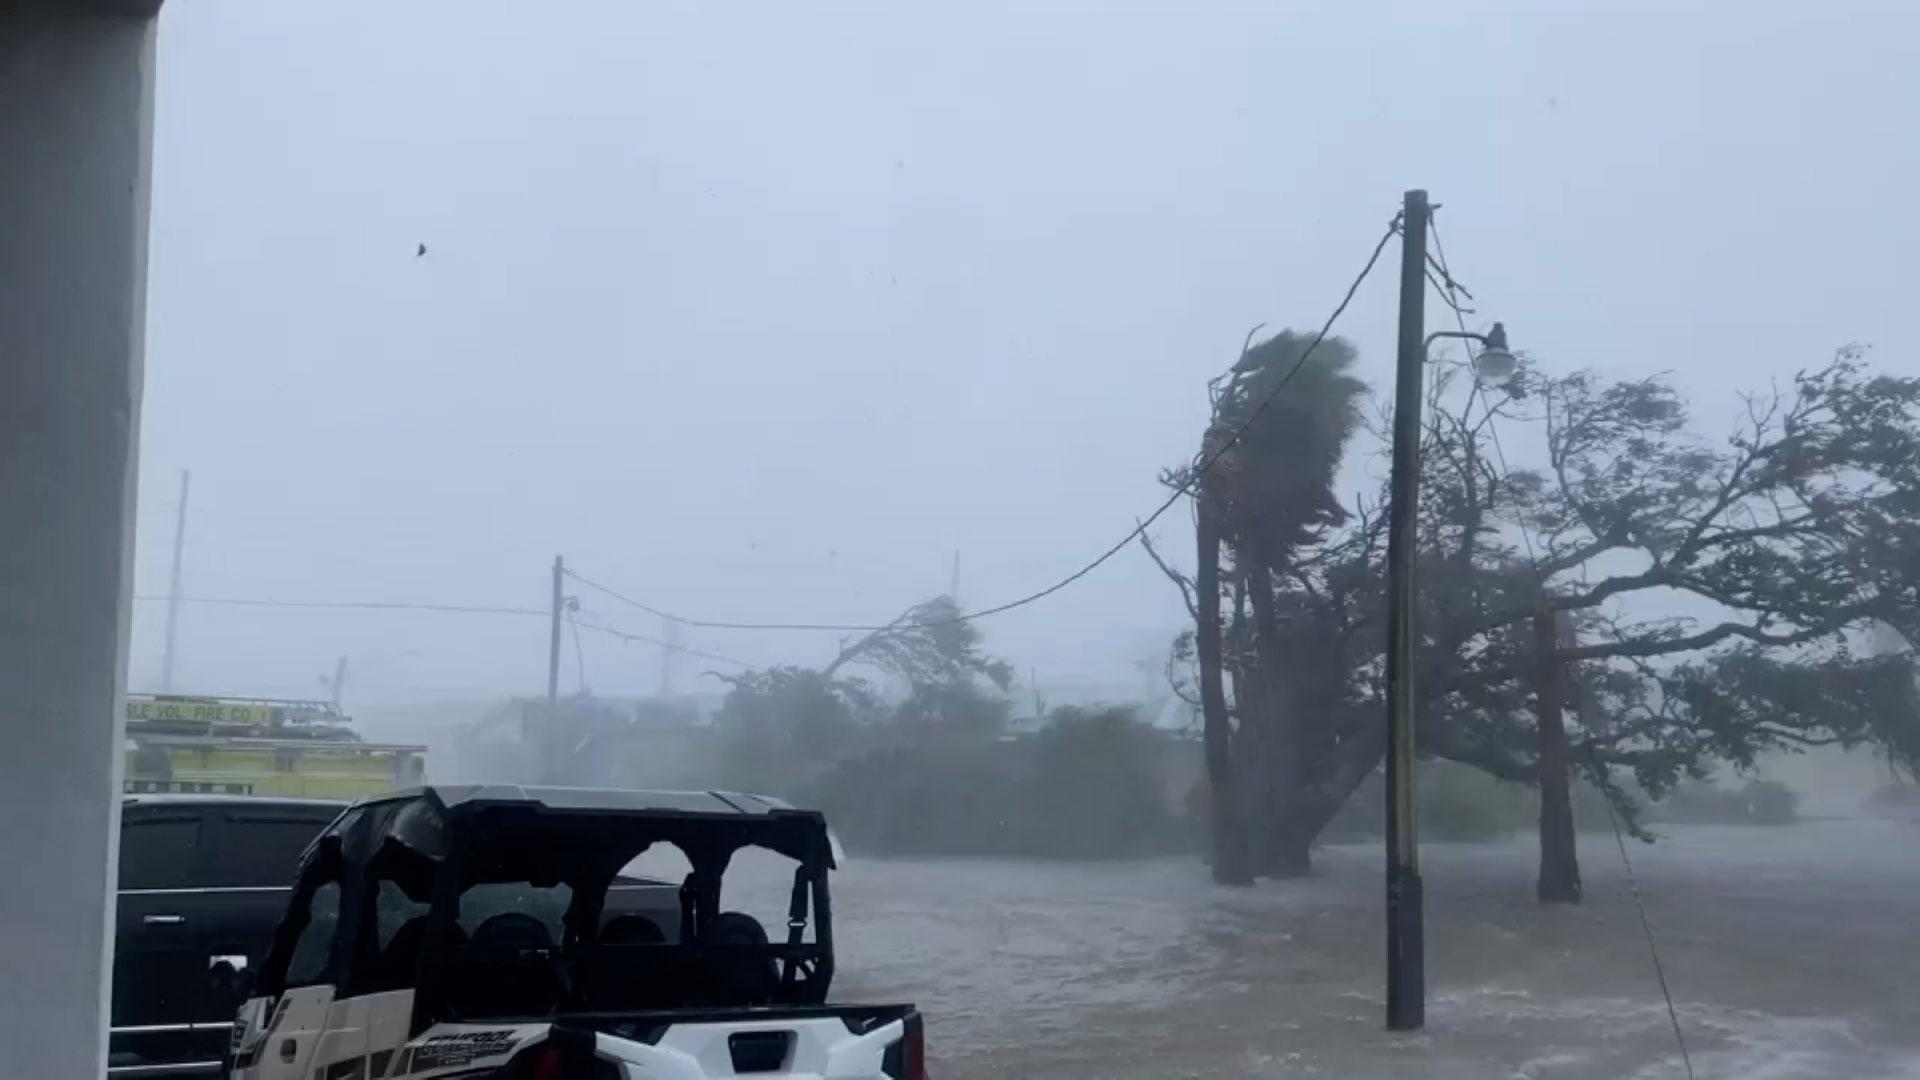 Grand Isle, Louisiana, on August 29, 2021.